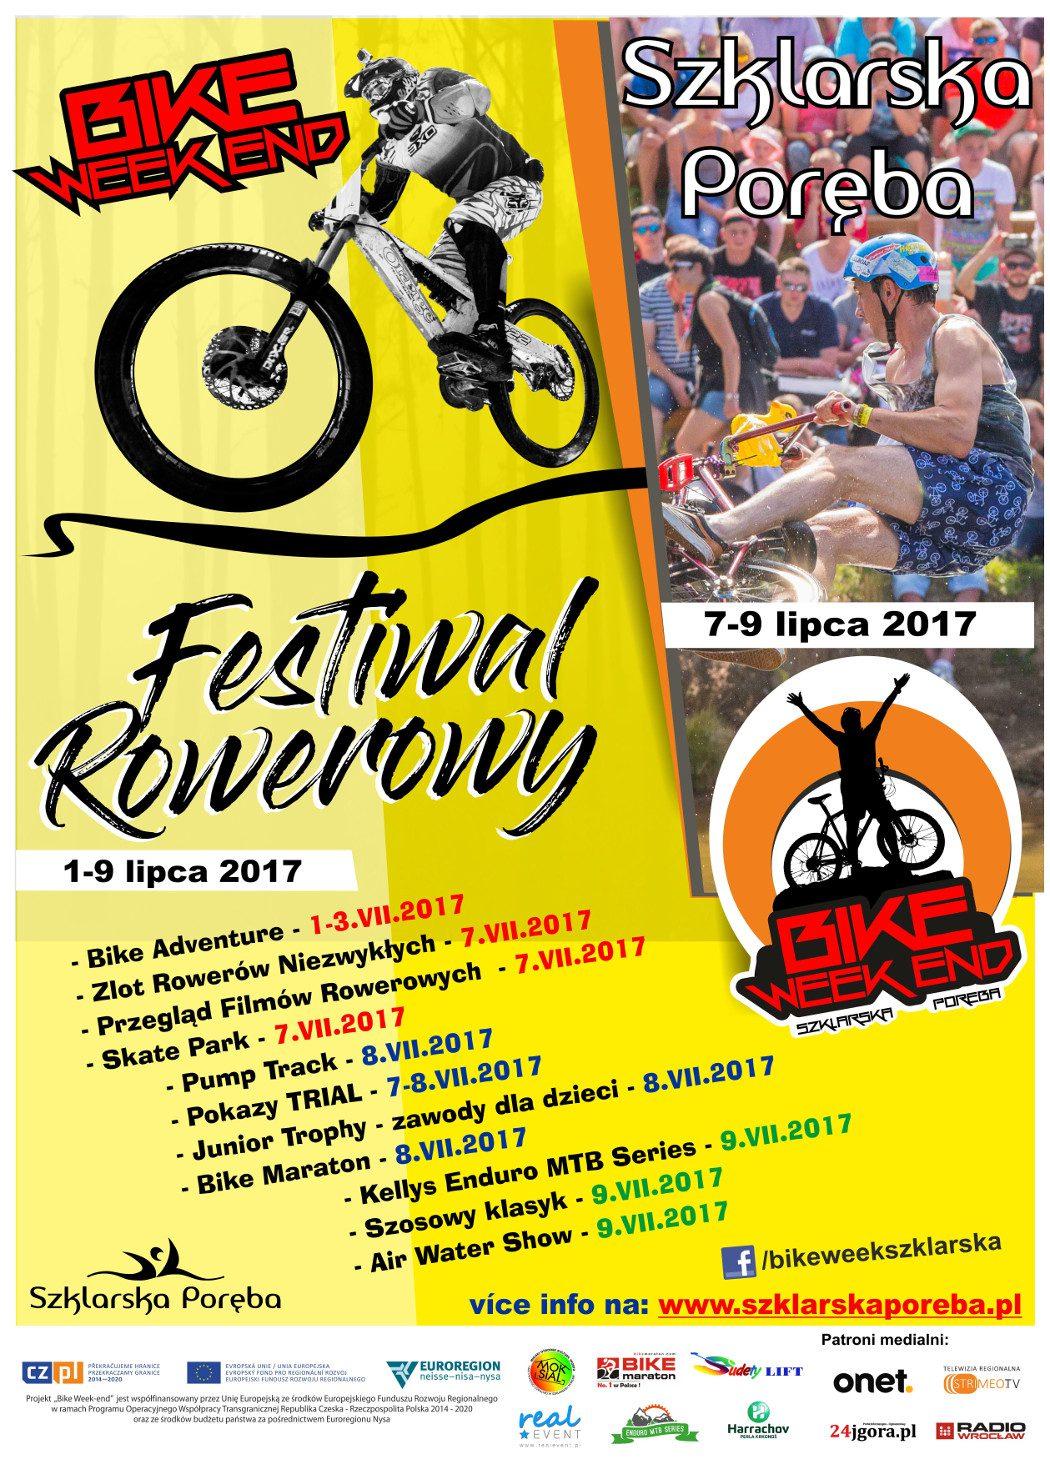 Festiwal Rowerowy Bike Week Szklarska Poręba 2017